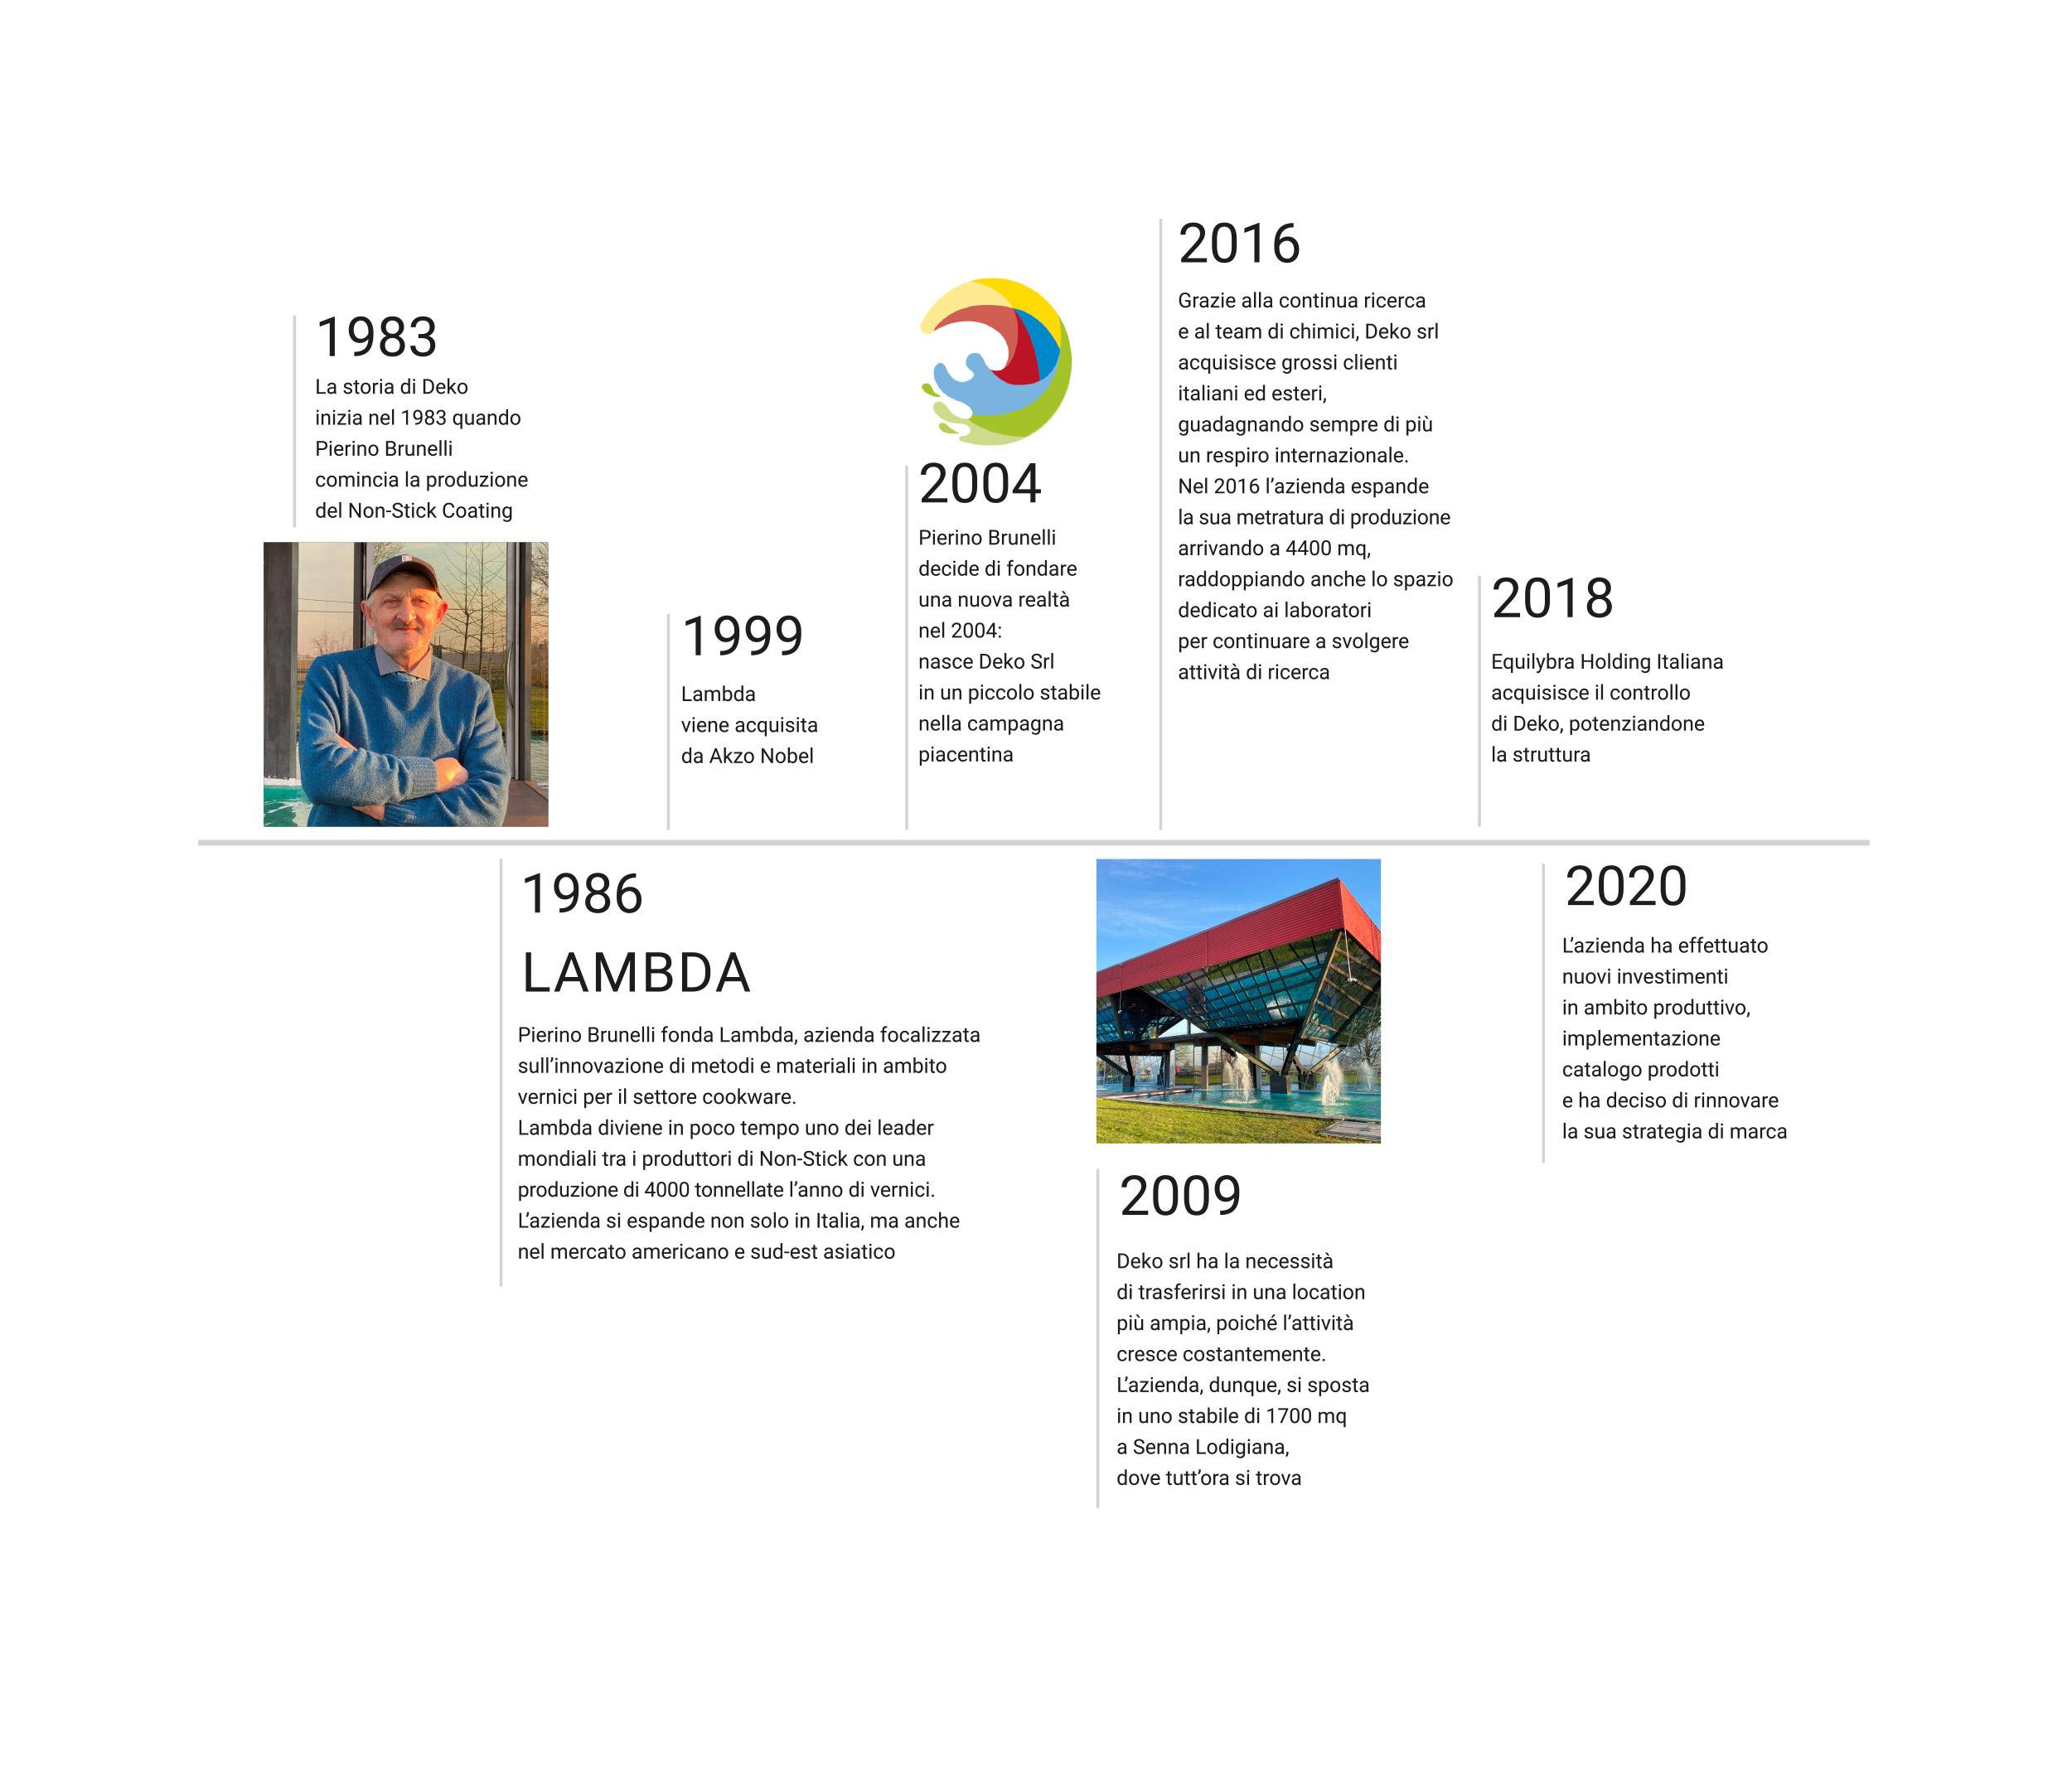 https://www.dekosrl.com/wp-content/uploads/2021/02/Storia-x-sito-ITA-1.jpg